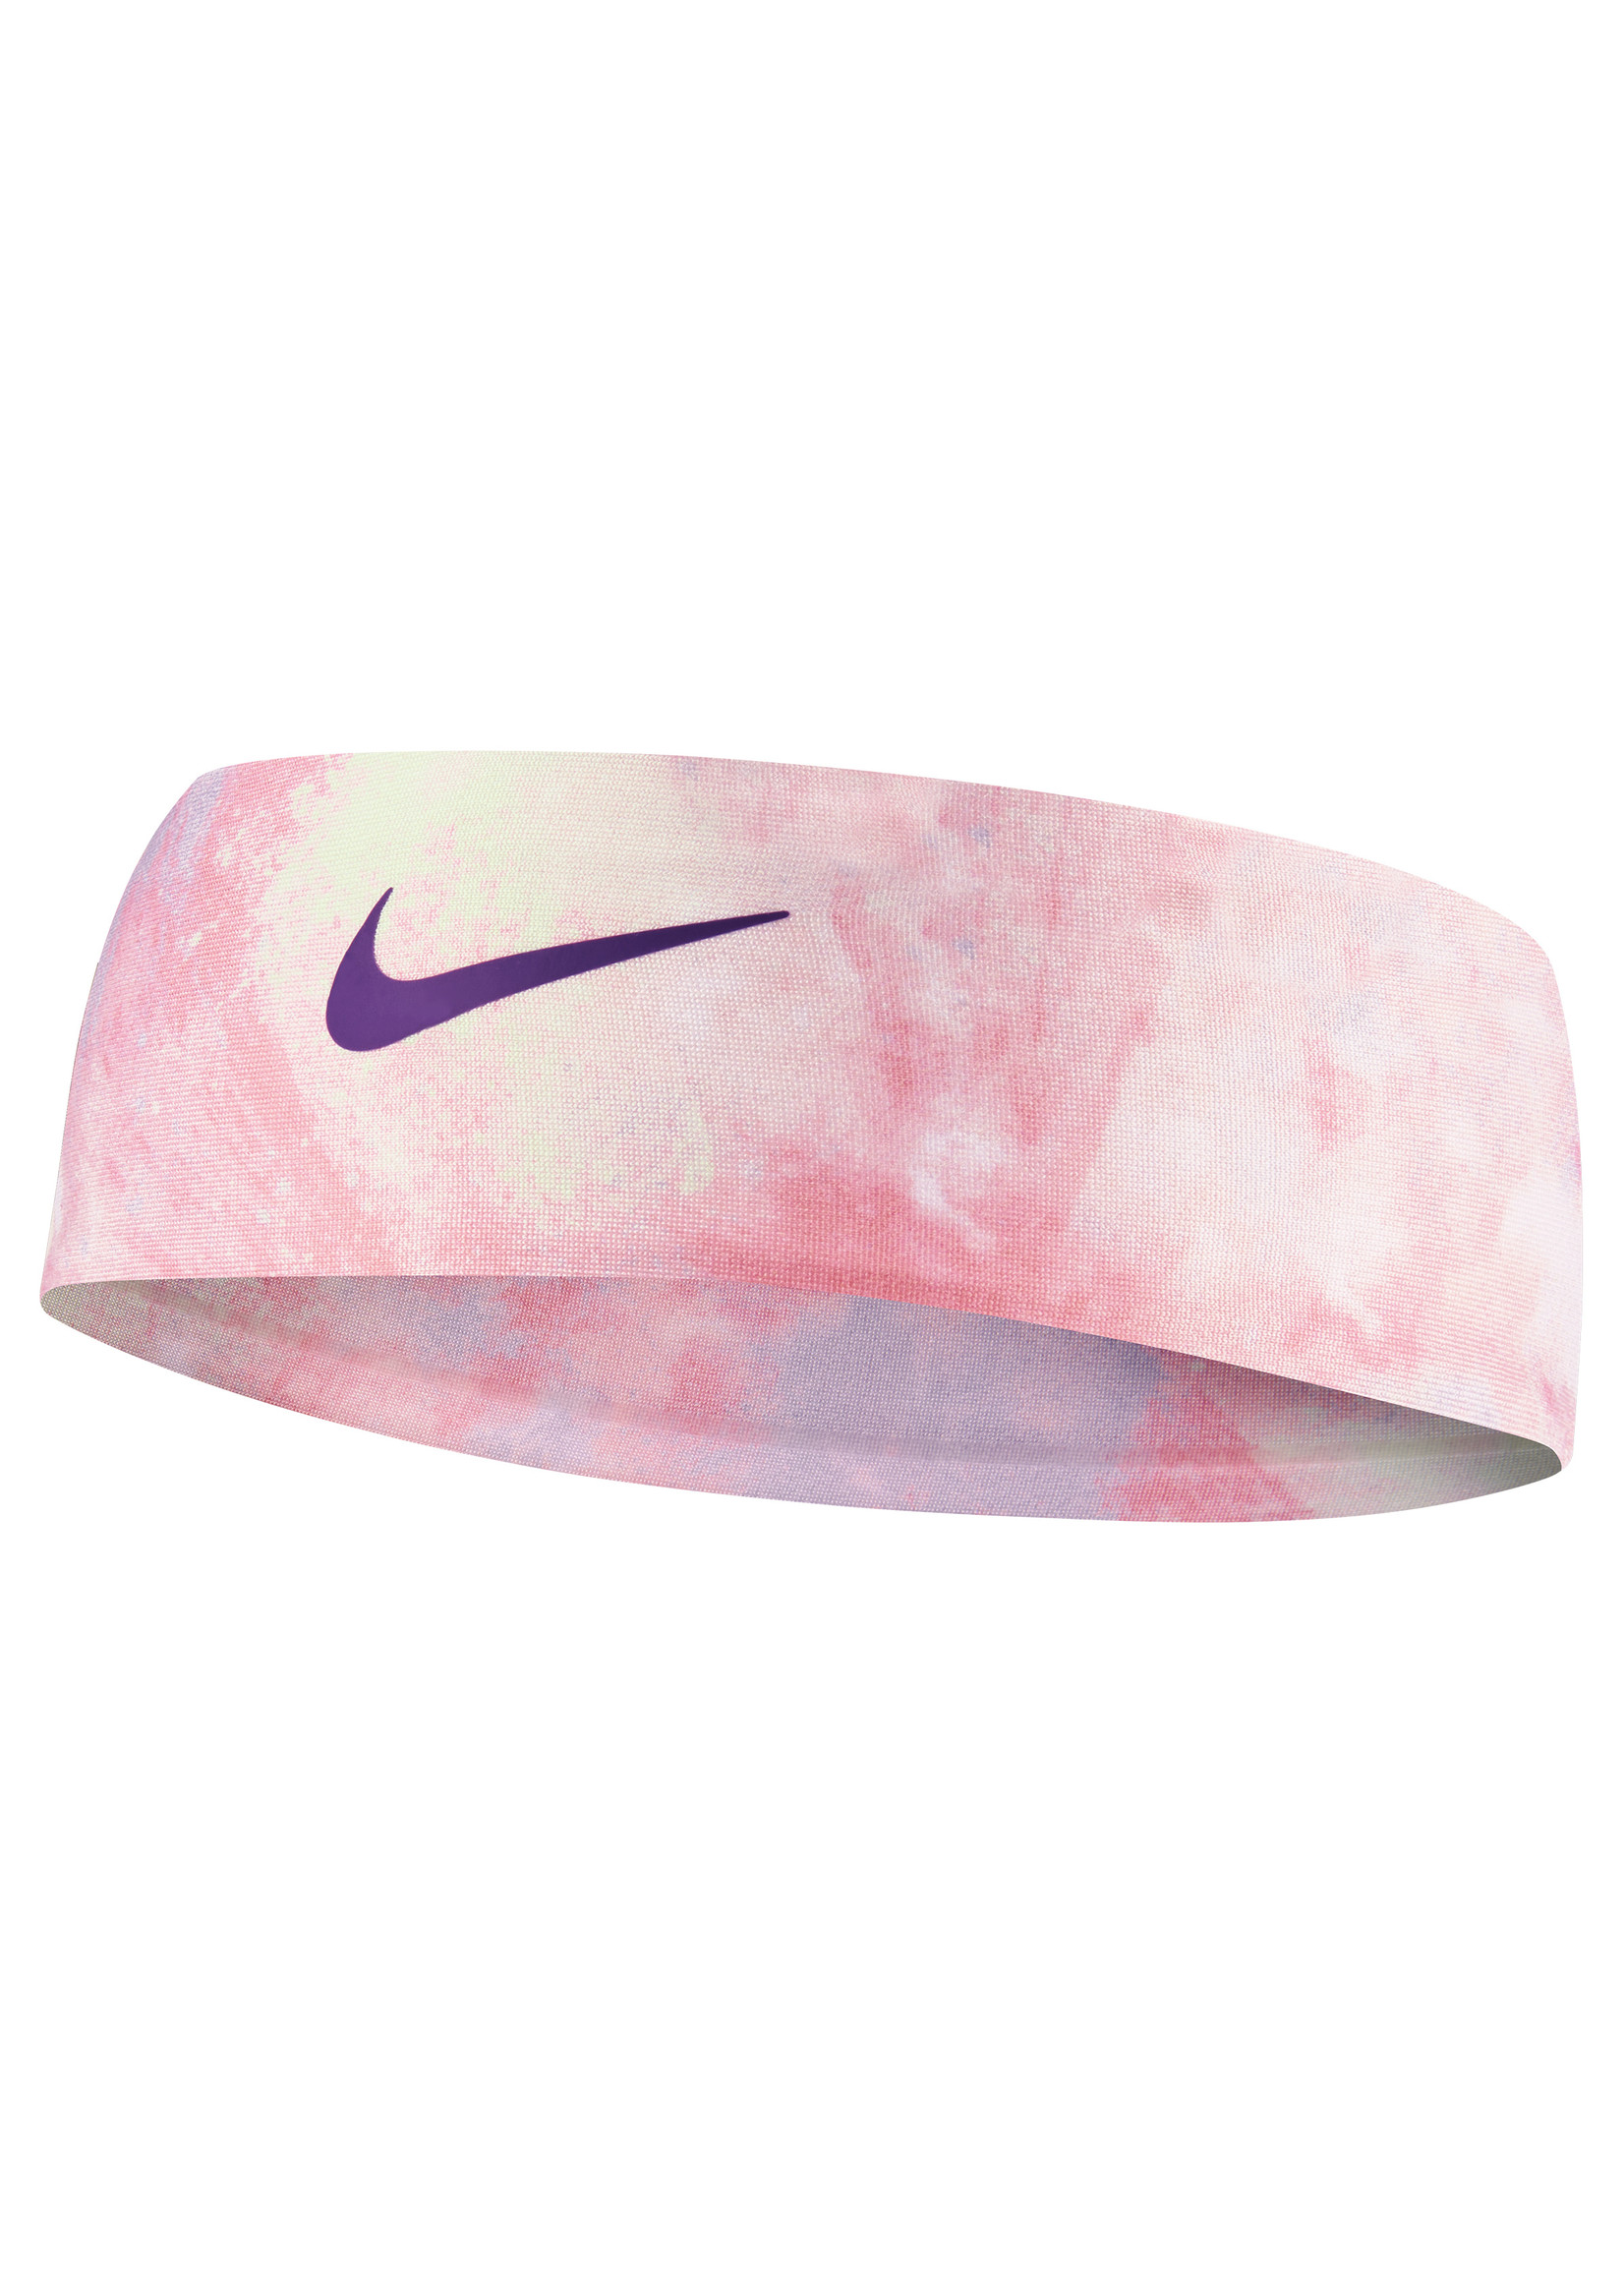 Nike Fury Headband 2.0 Pink/ Purple Youth